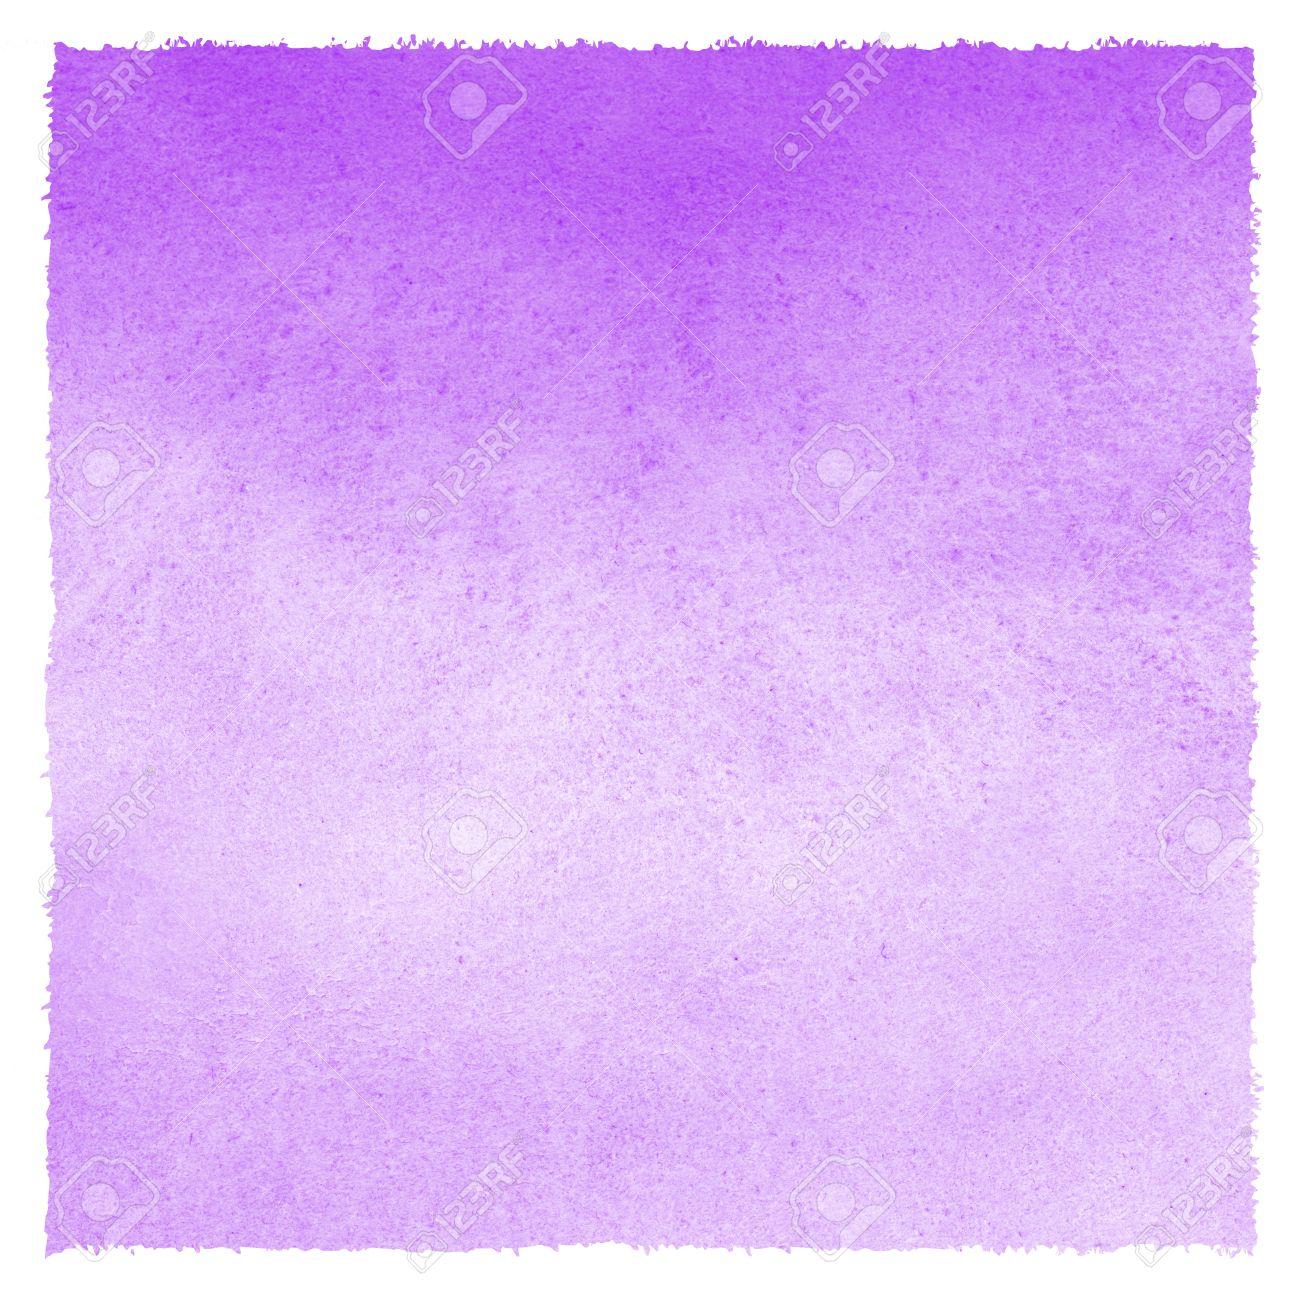 Lila Lavanda Acuarela Mancha Fondo De Pascua Con Bordes Irregulares - Color-lila-pastel